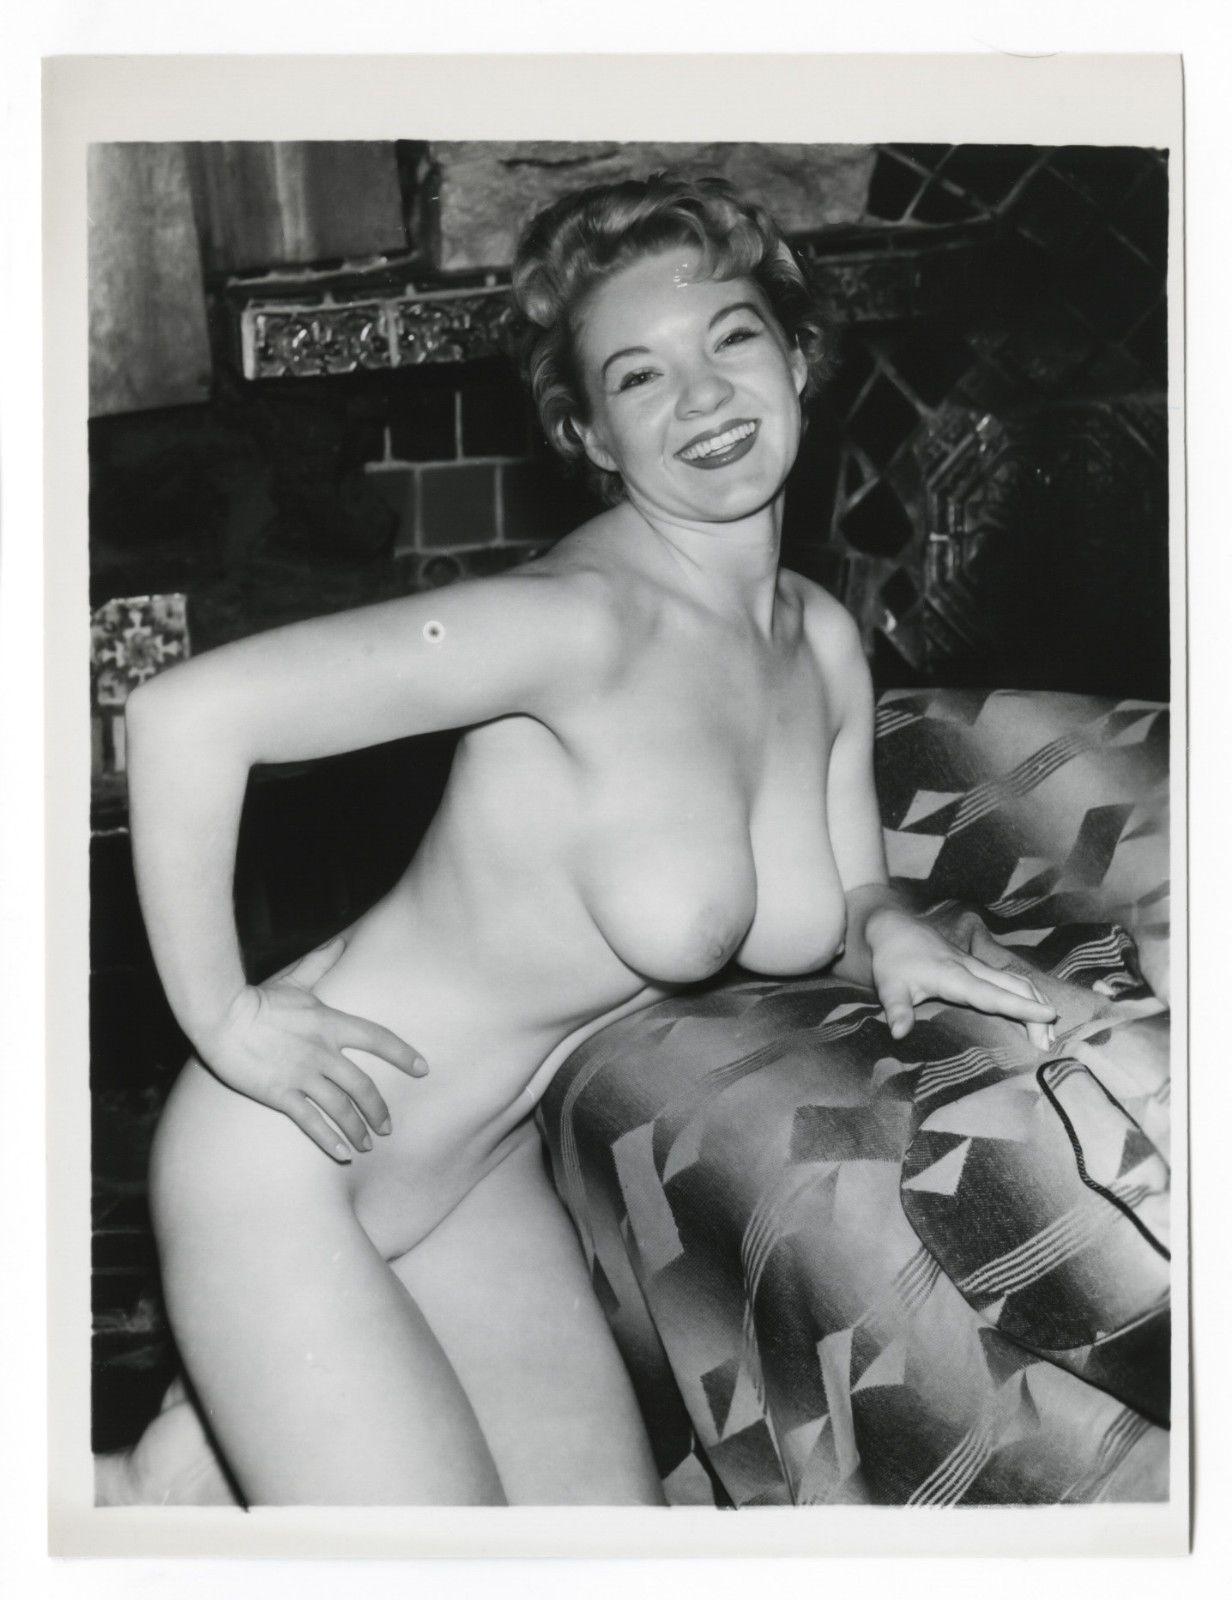 Big brother jessie godderz nude